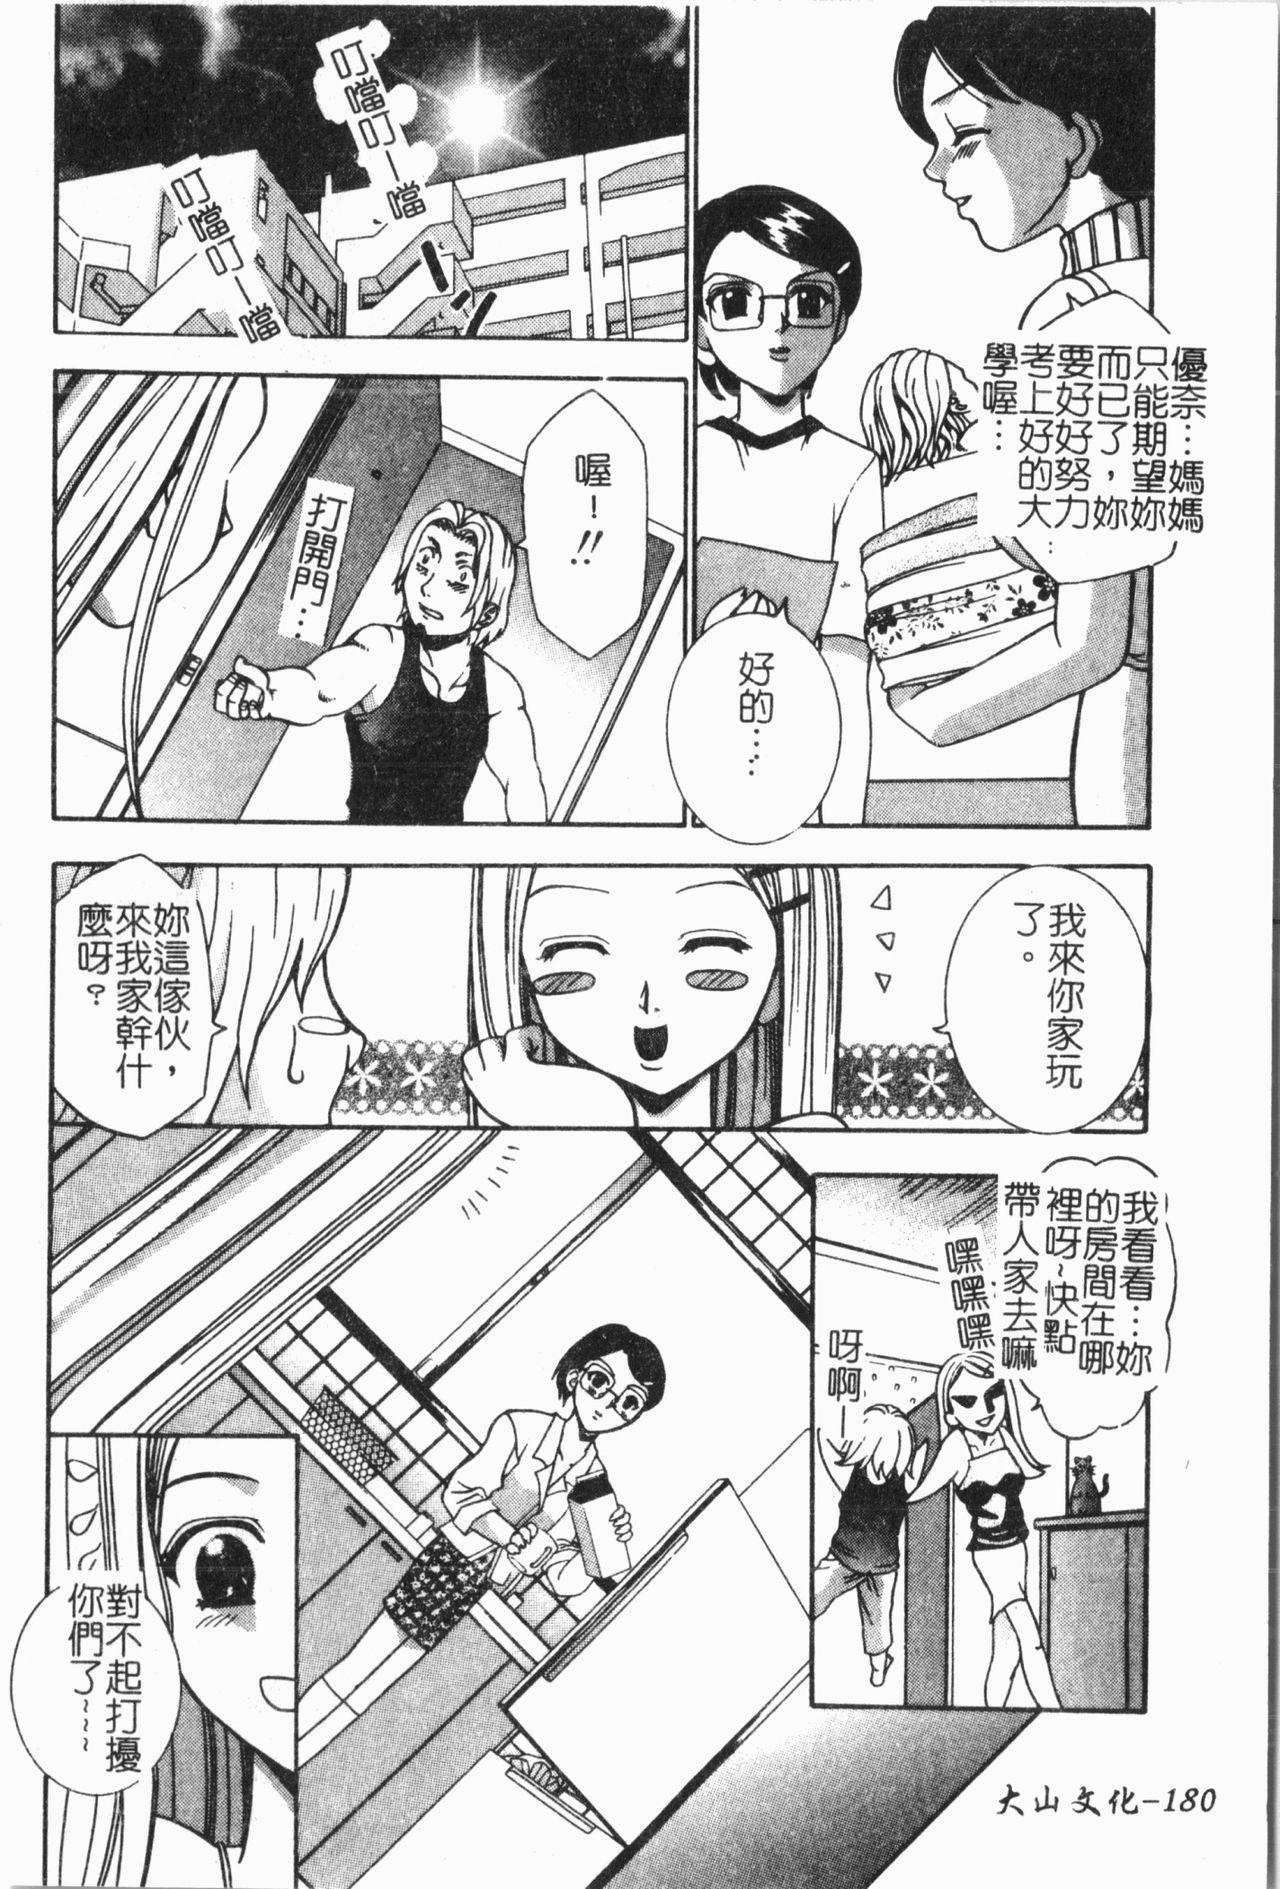 Imouto Koishi 6 182